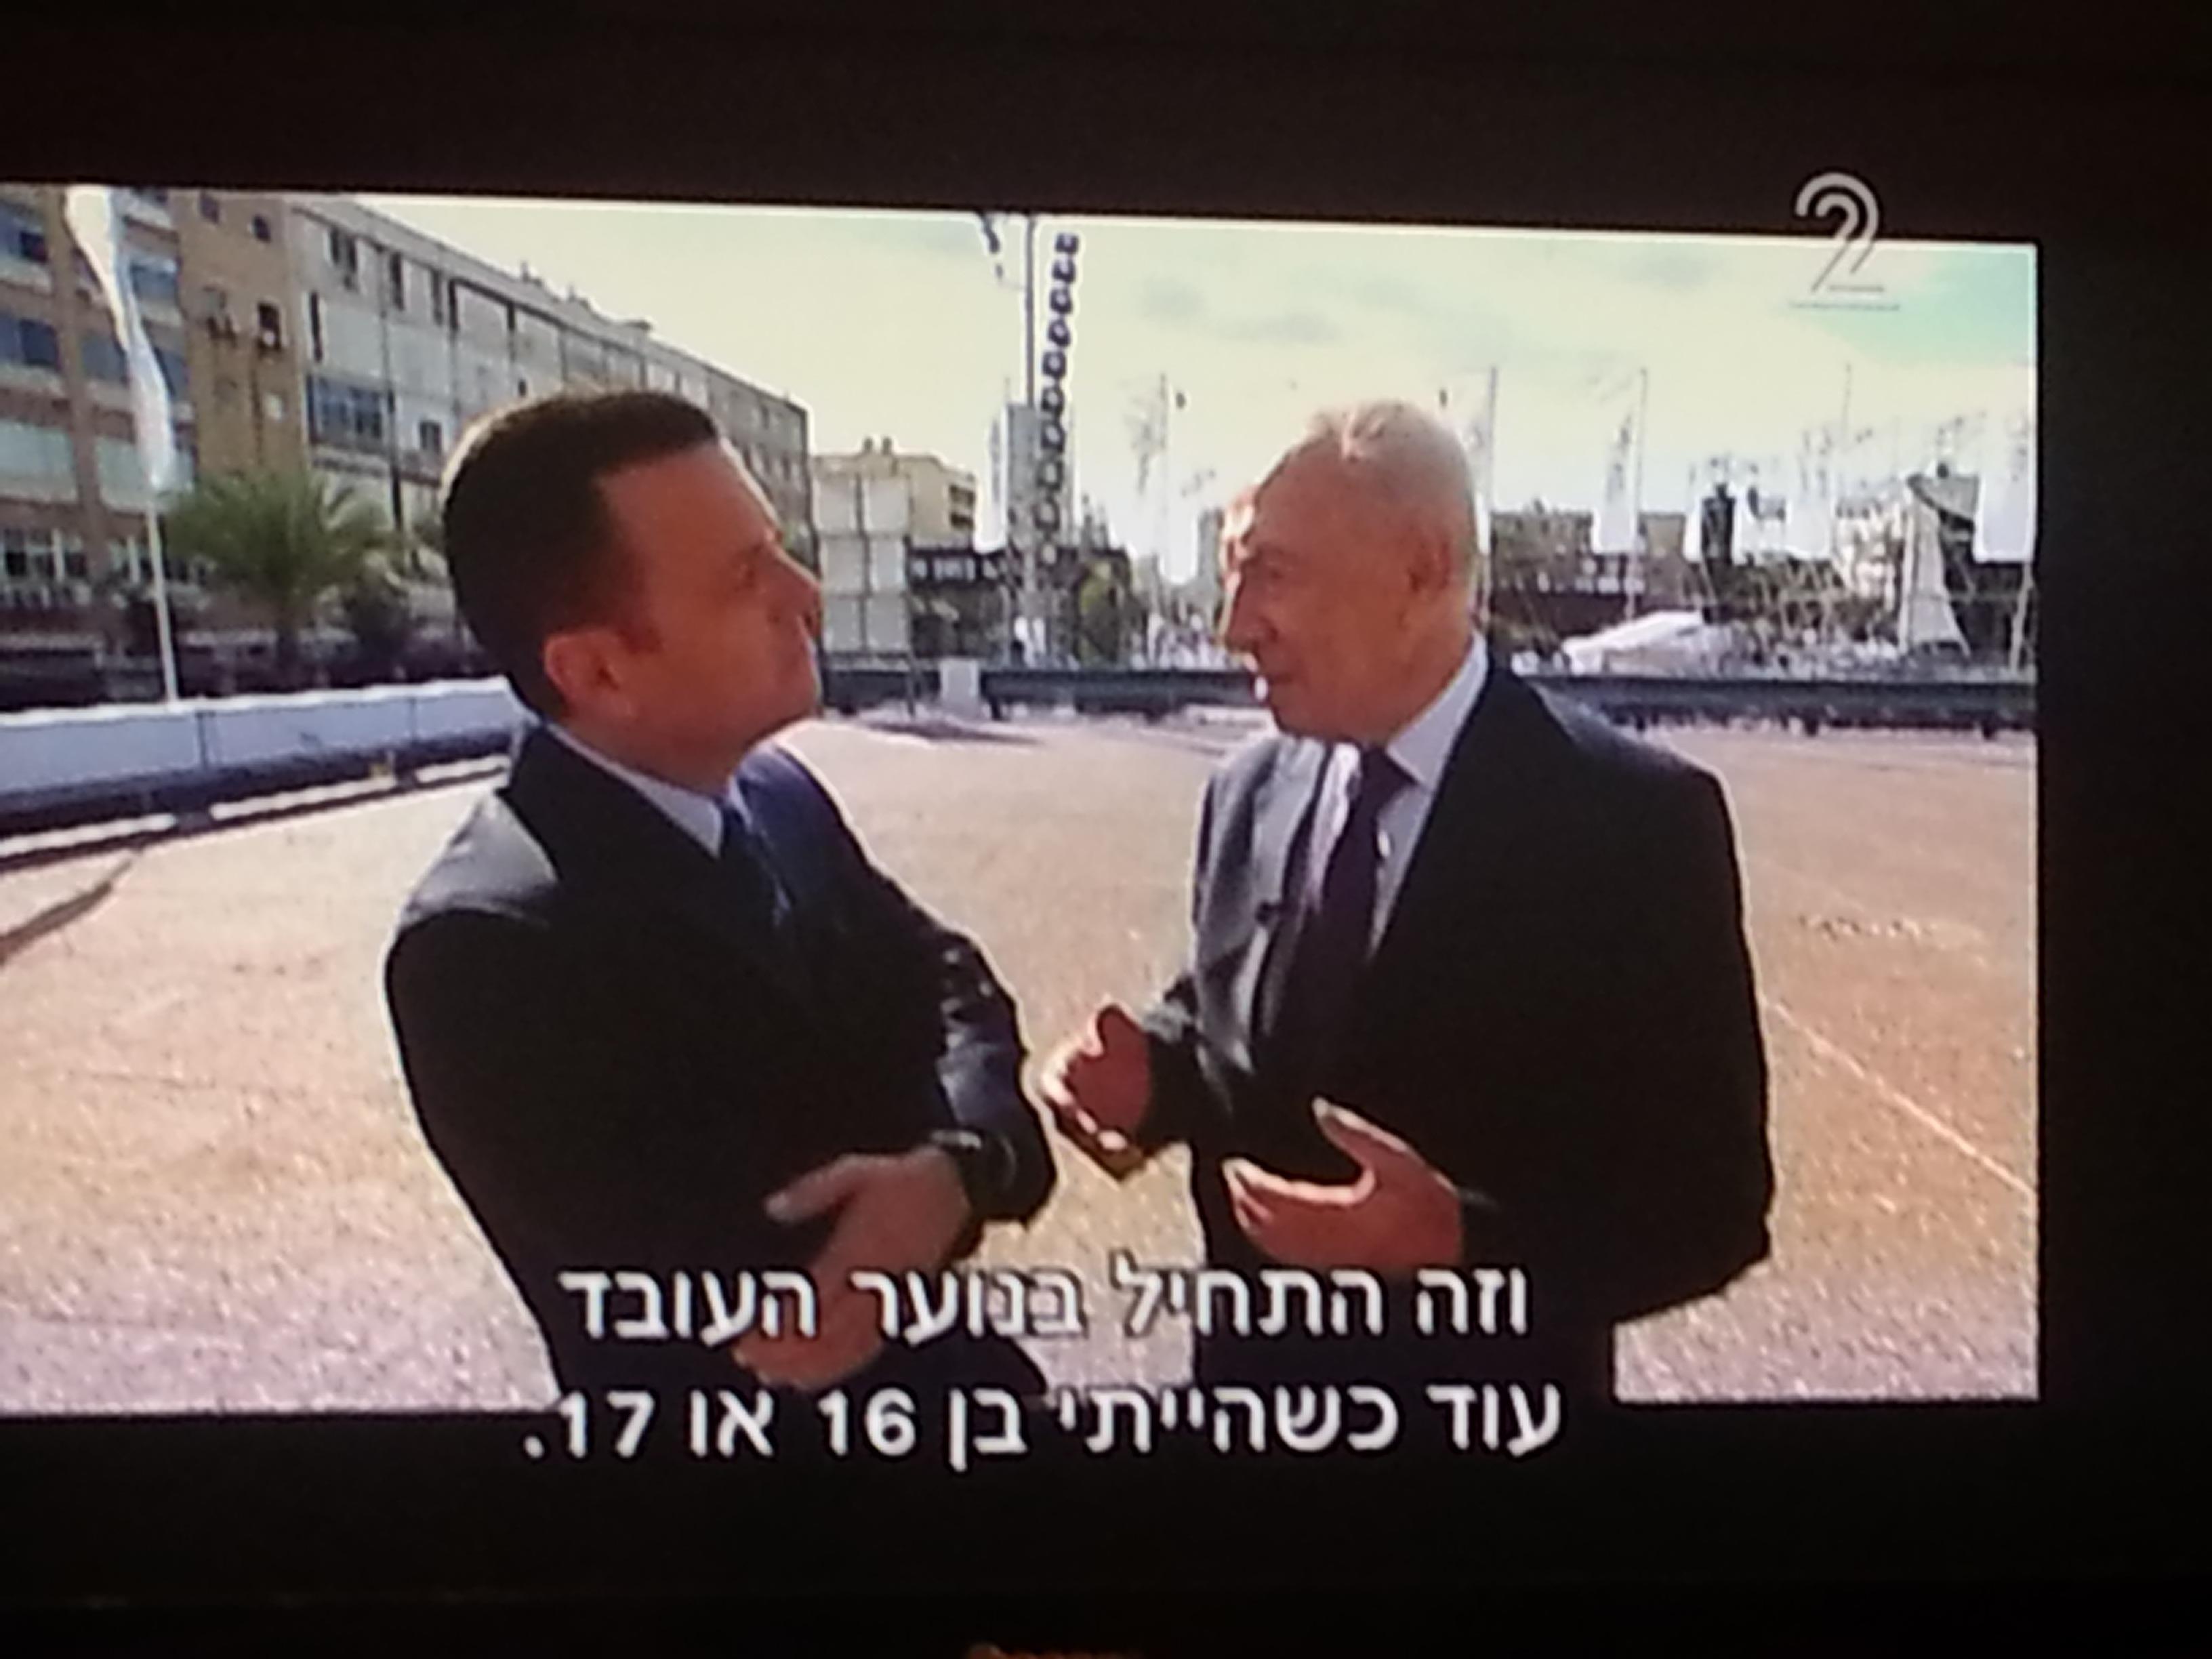 שמעון פרס חוזר לכיכר, יעקב אילון - לערוץ 2